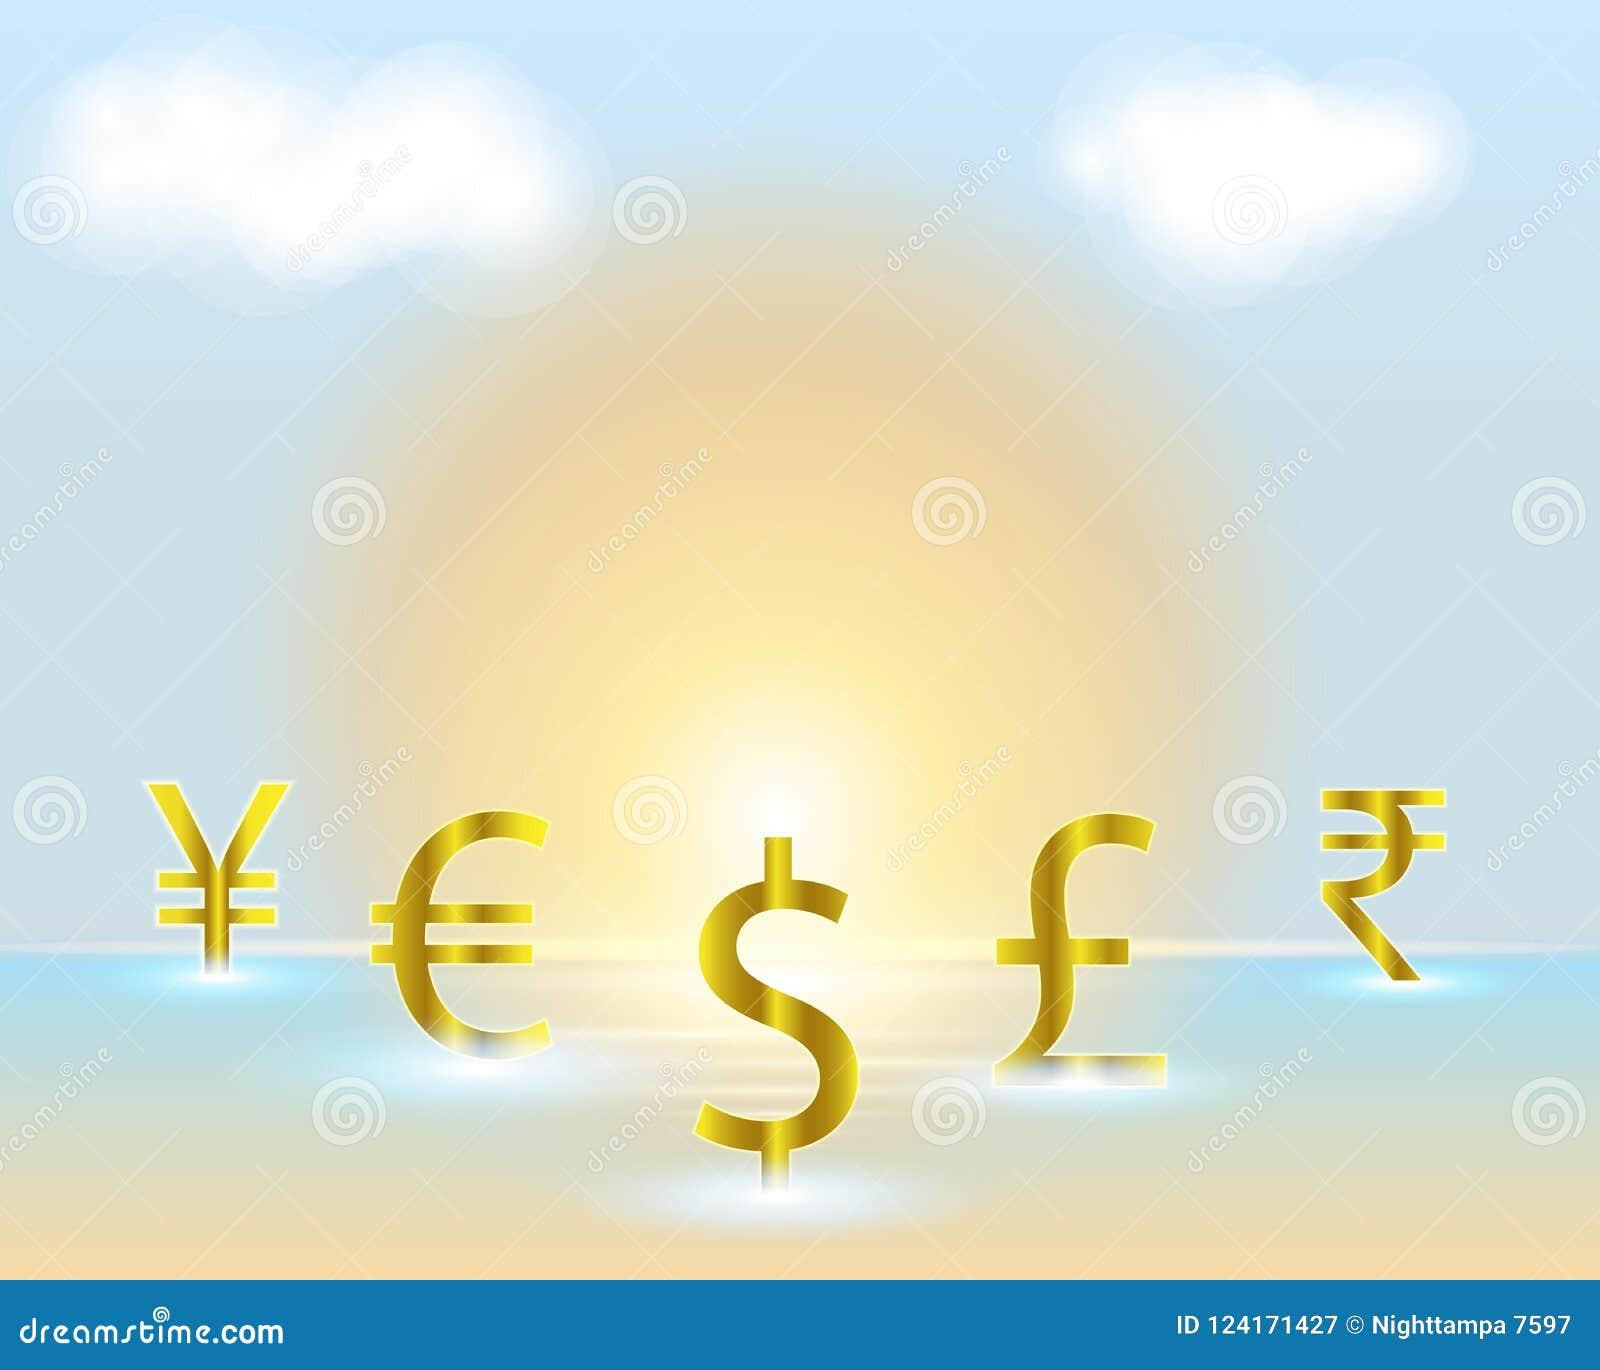 Currency Symbol Dollareurorupeepoundmoney Exchange Concepts